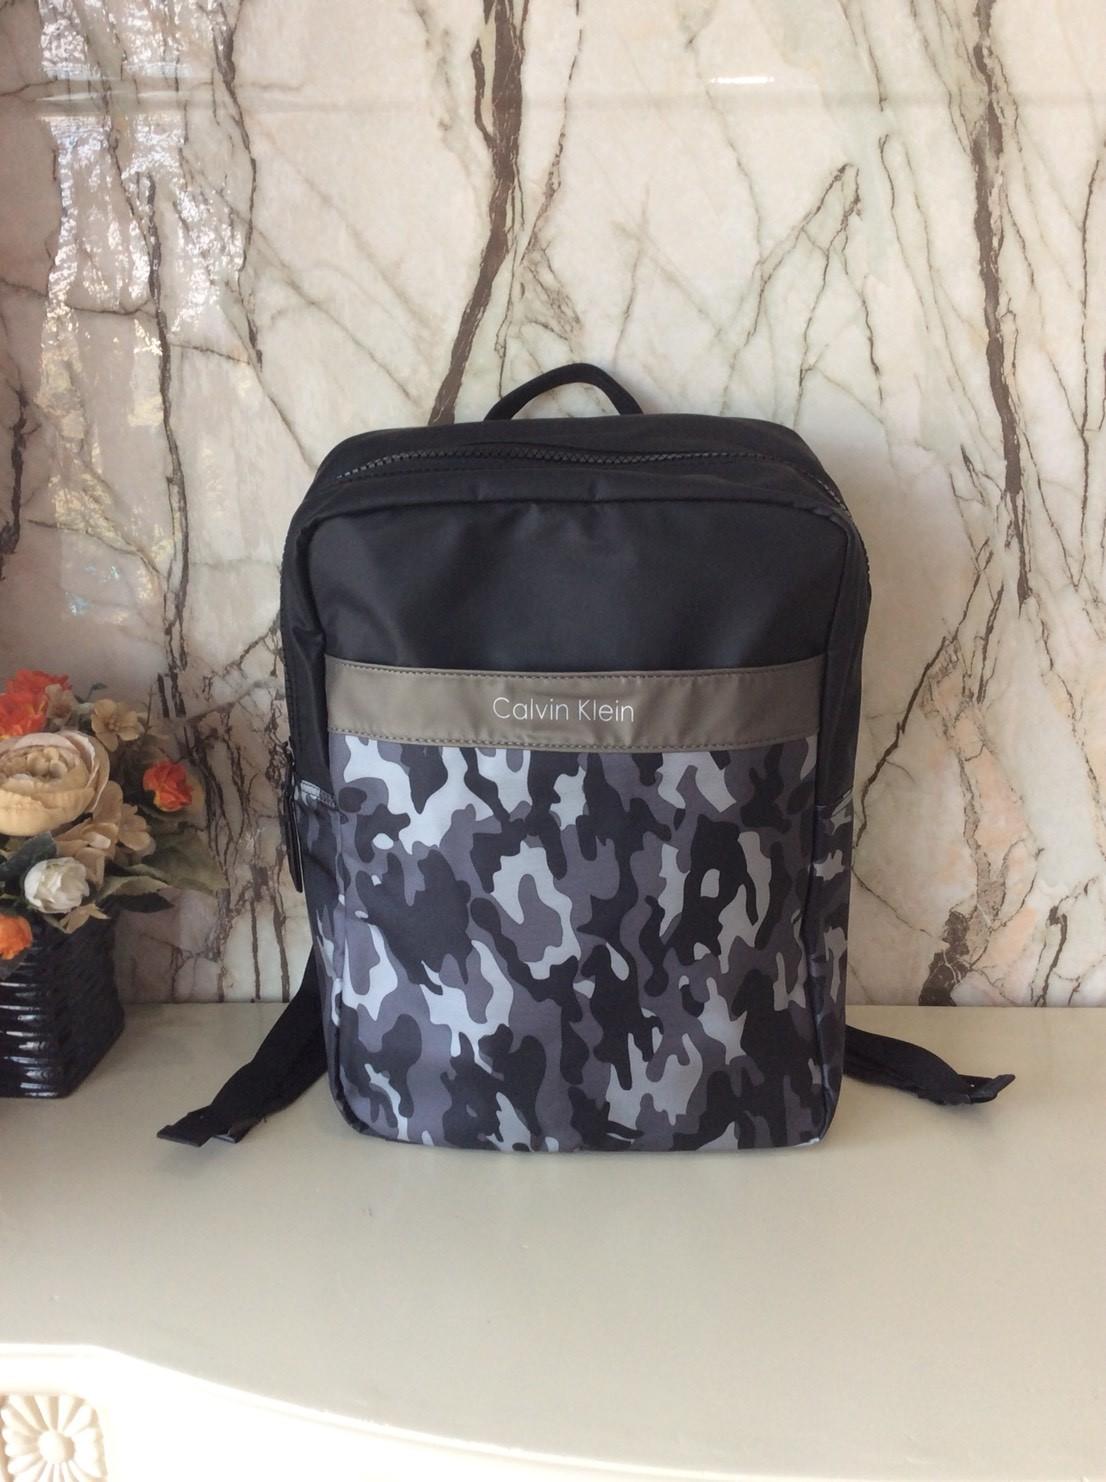 91e089305 Calvin Klein Jeans Backpack กระเป๋าสะพายเป้ใบใหญ่ ลายทหาร - SMT Princess-Quinns  Soap-Outlet Bag-กระเป๋าแฟชั่น : Inspired by LnwShop.com